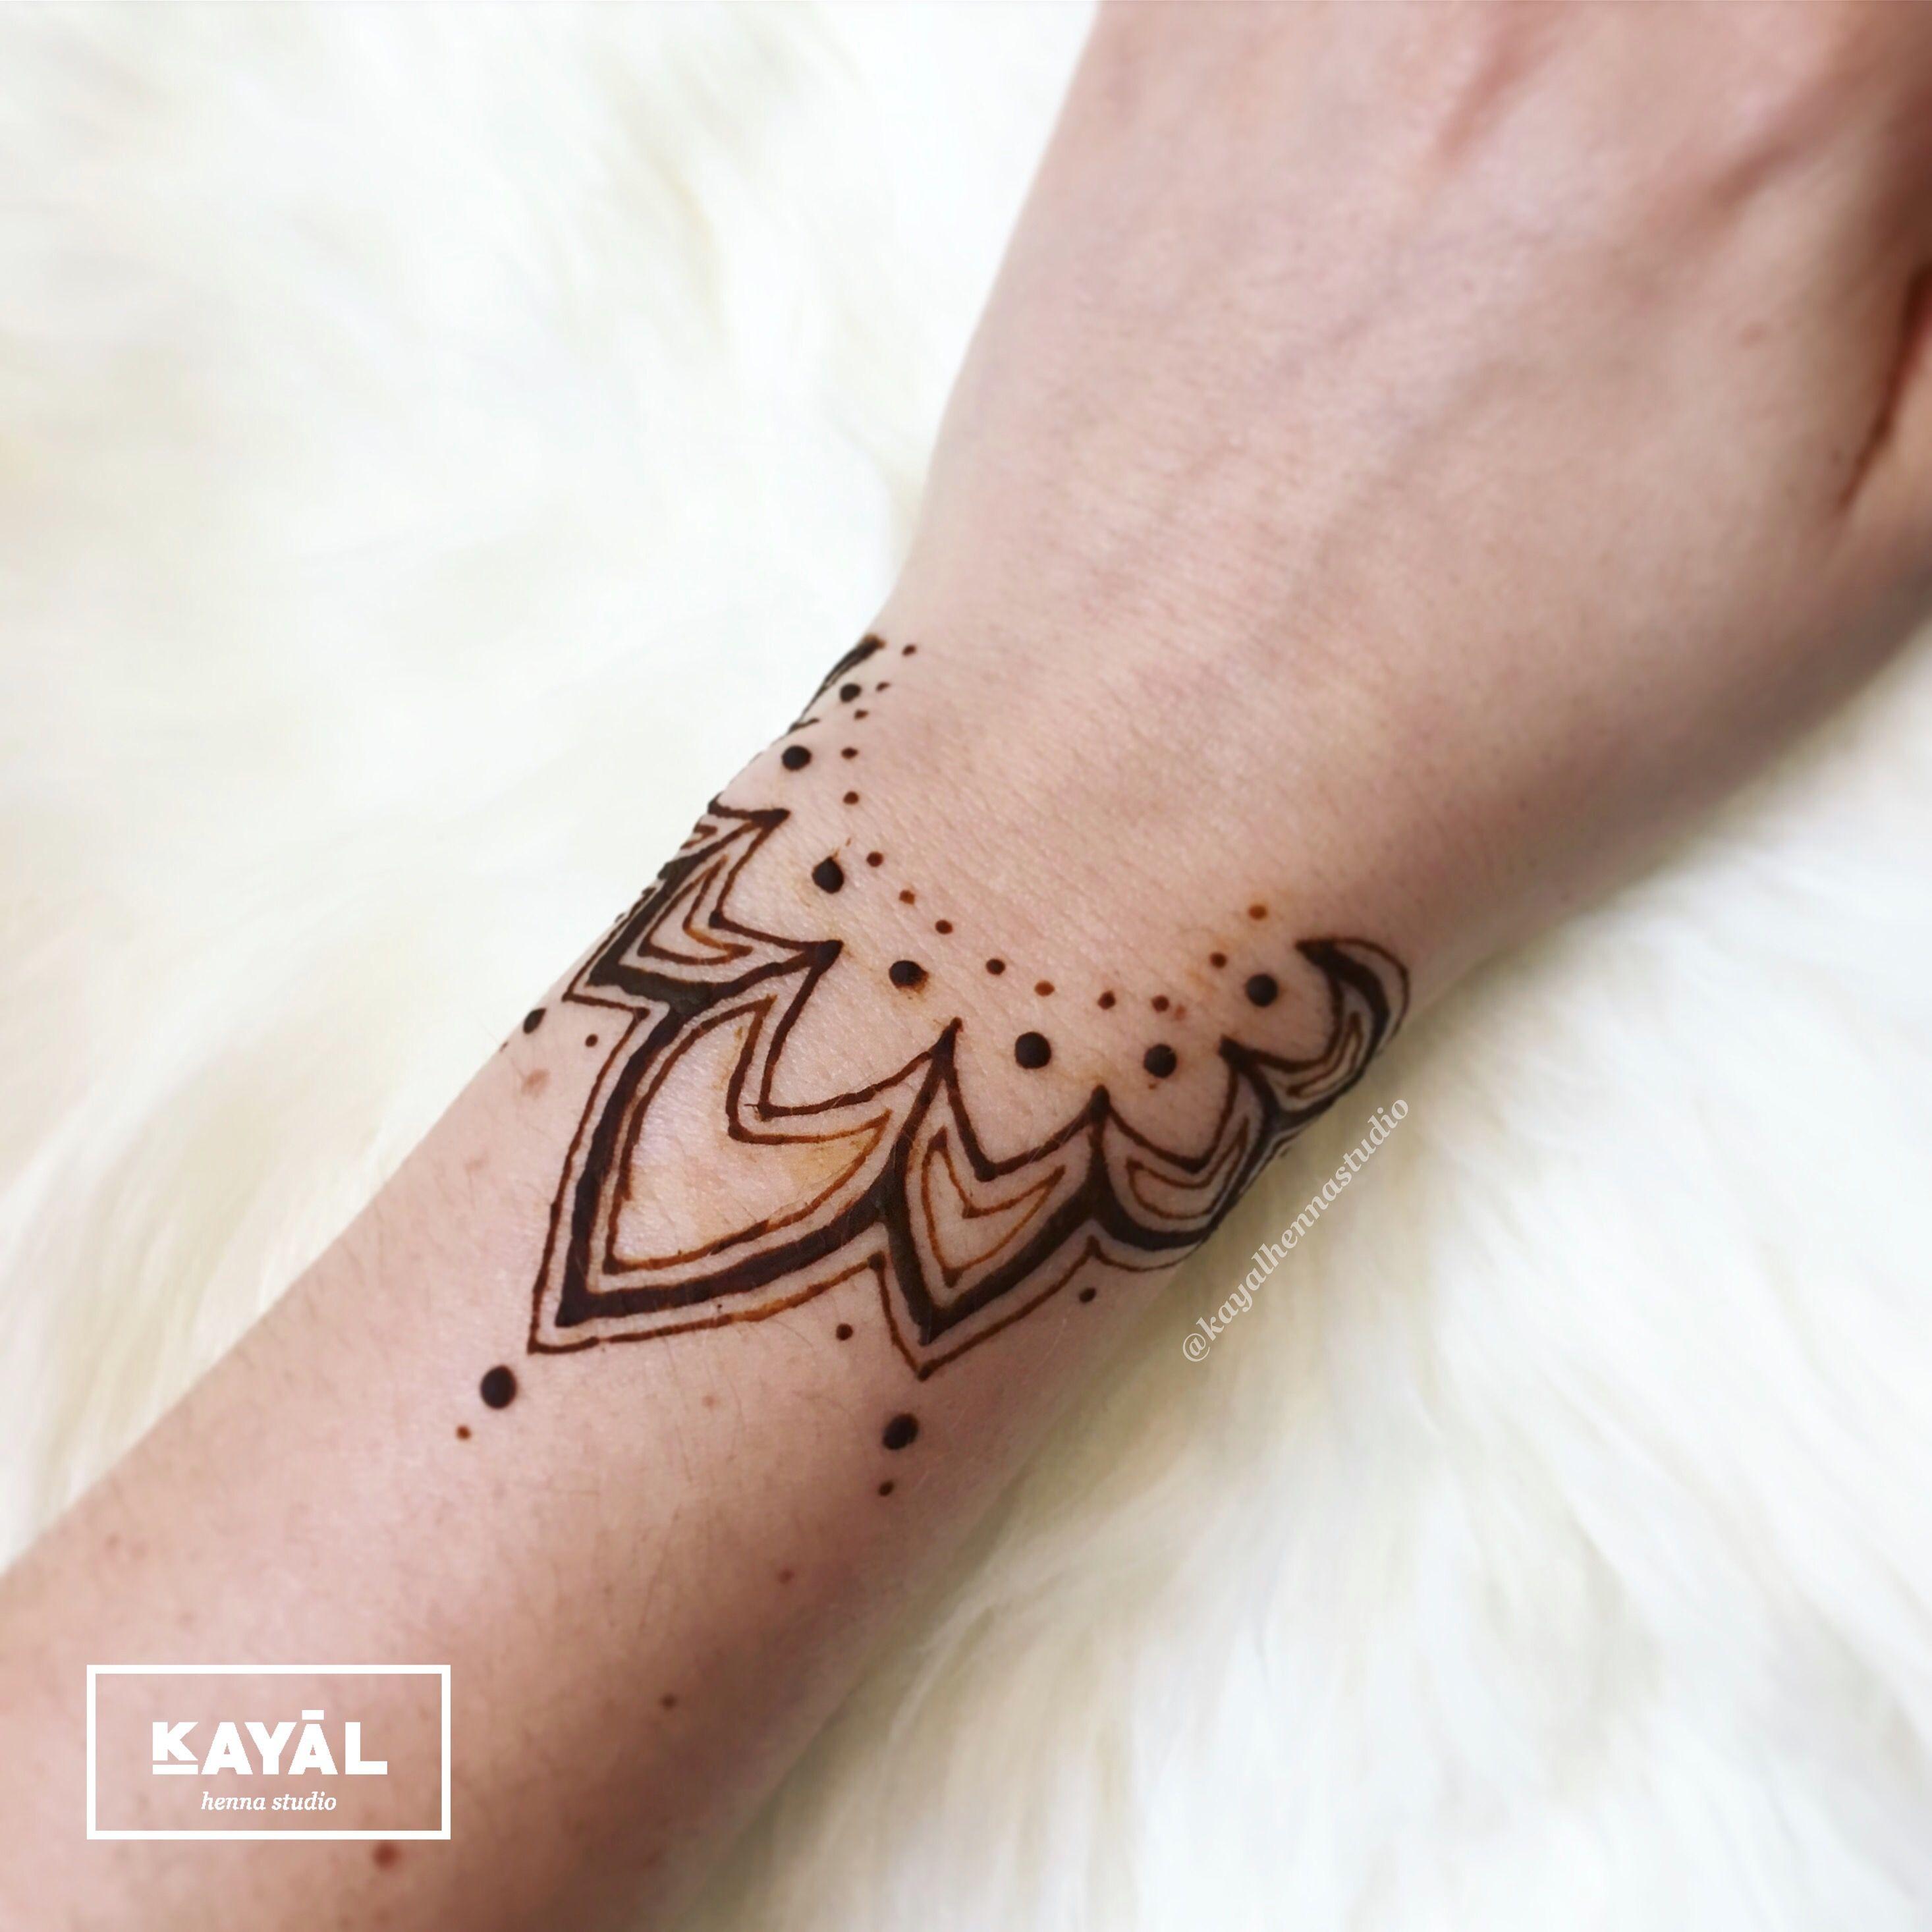 Henna Cuff Www Jamilahhennacreations Com: Henna Bracelet Design By Ḵayāl Henna Studio. Instagram